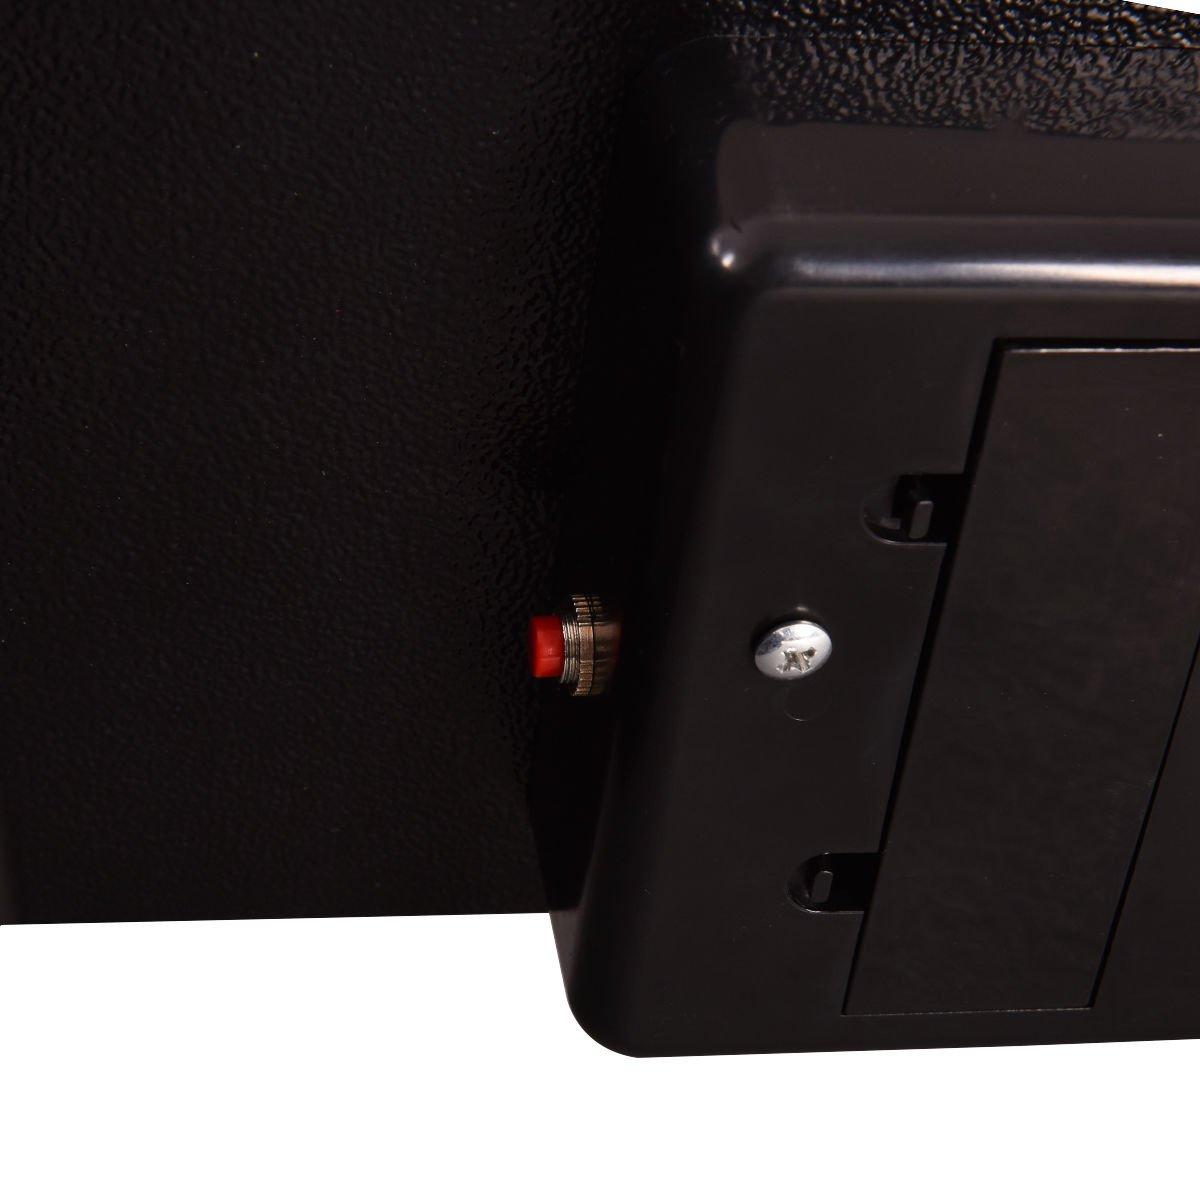 BS Fingerprint: 15.7 x 15.7 x 7.8 Safstar Cabinet Safes Biometric Fingerprint Electronic Digital Keypad Lock Security Box for Cash Jewelry Passport Guns Collectibles